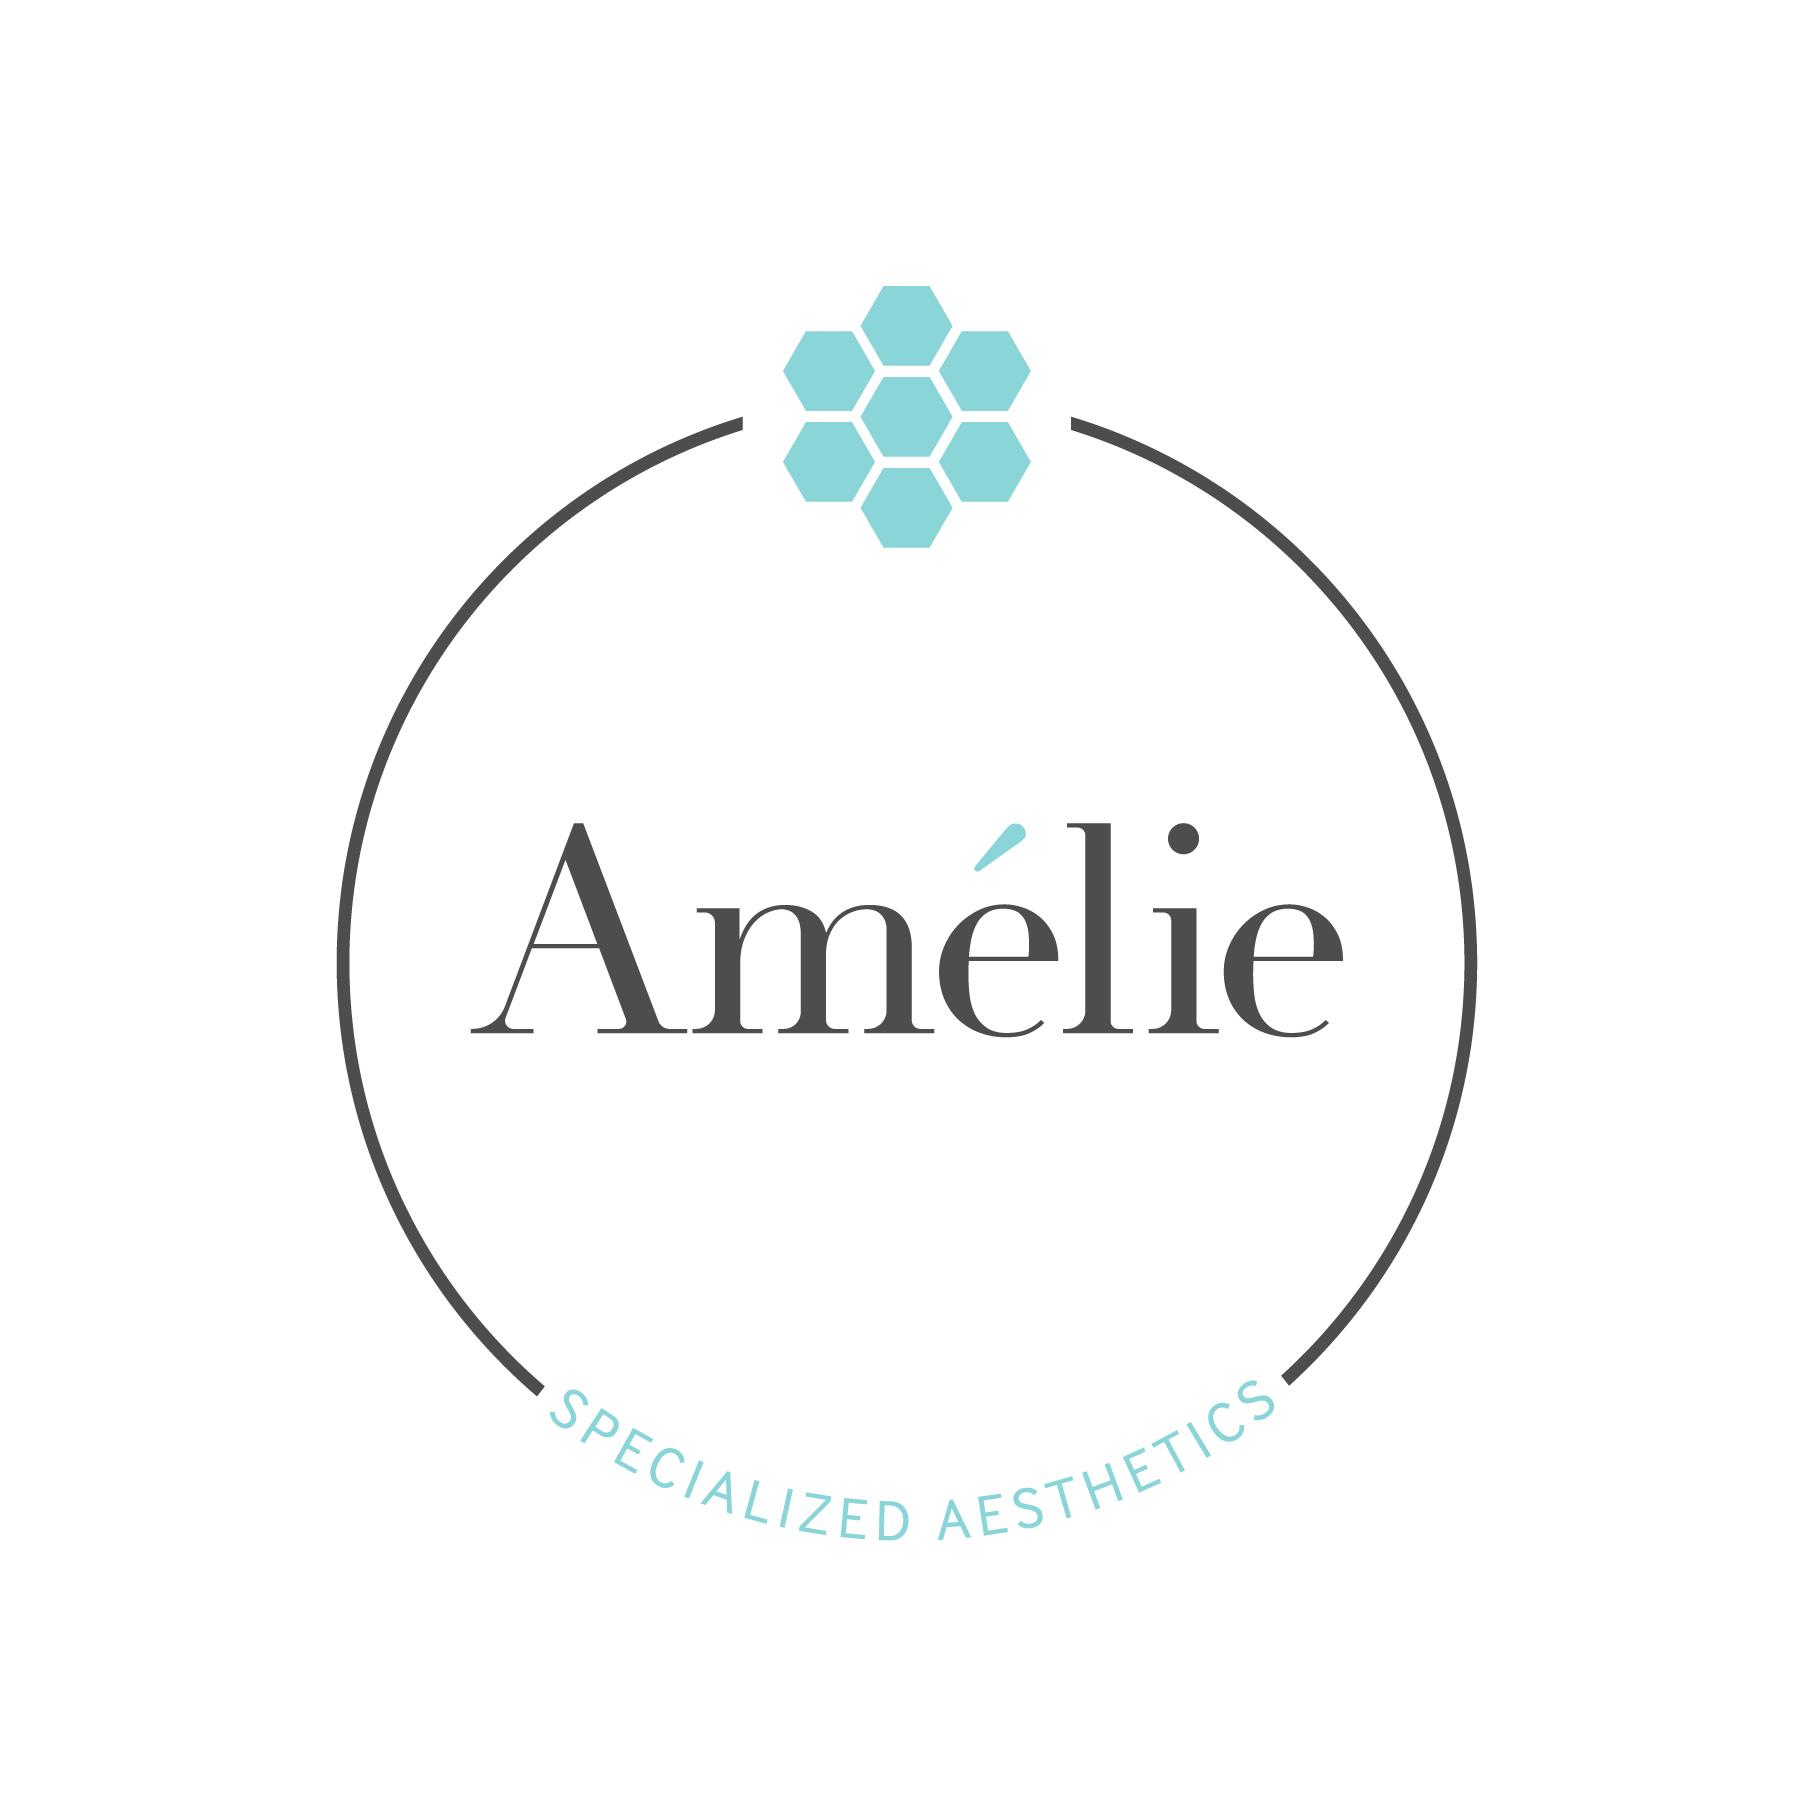 Amelie_Secondary.jpg